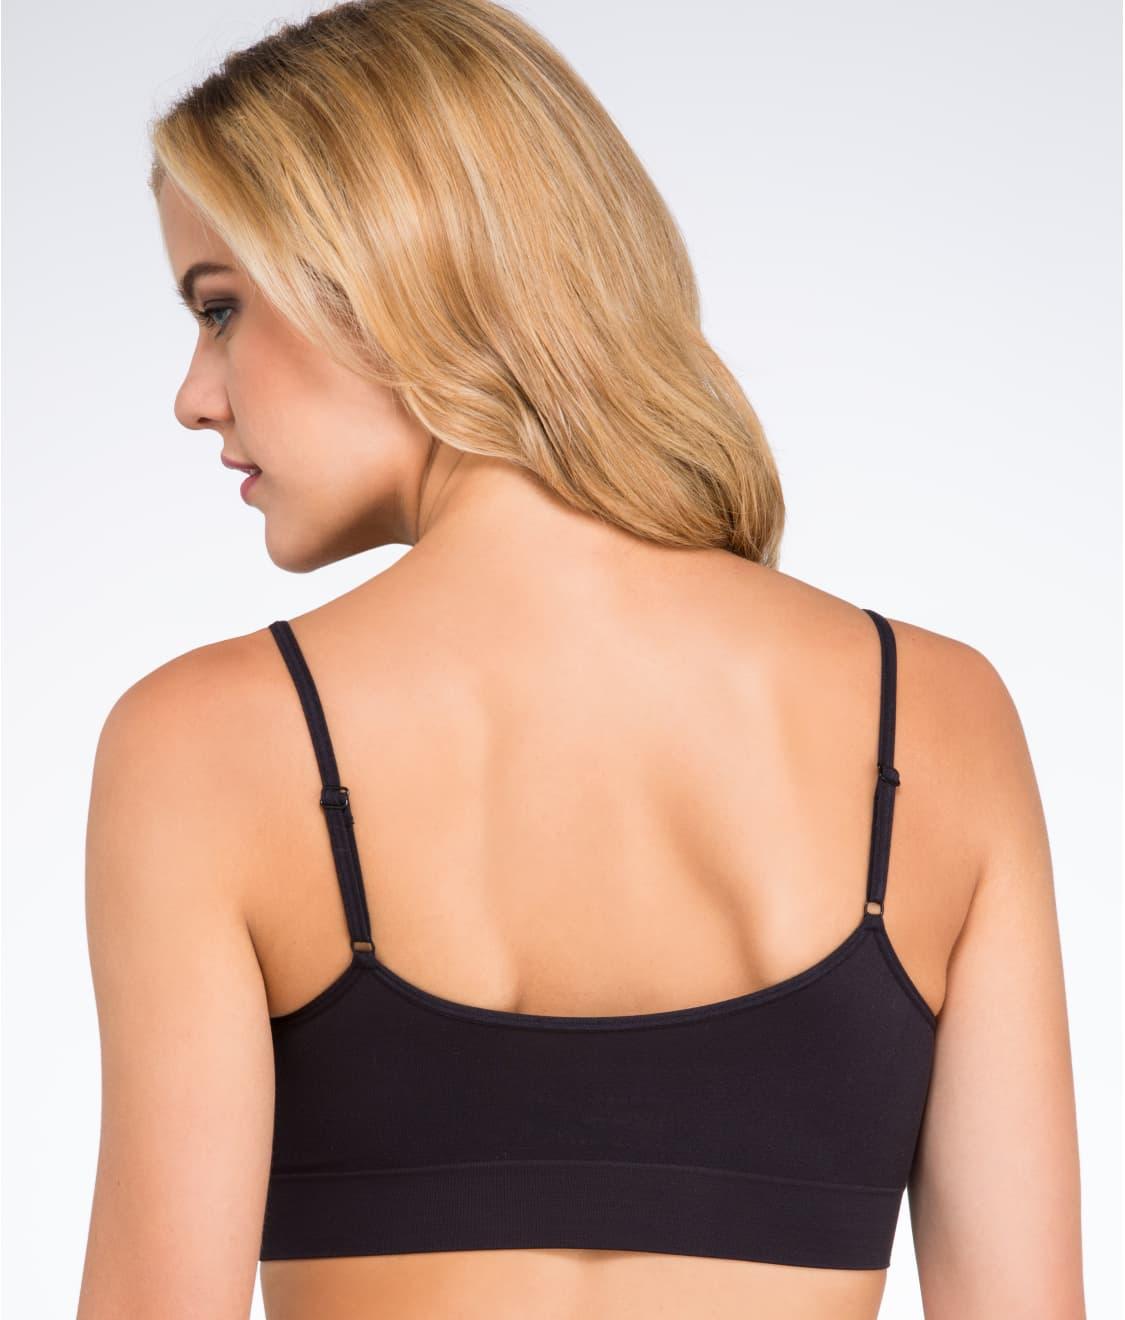 ce735bf7068 See Modern Micro Seamfree® Cami Strap Bralette in Black